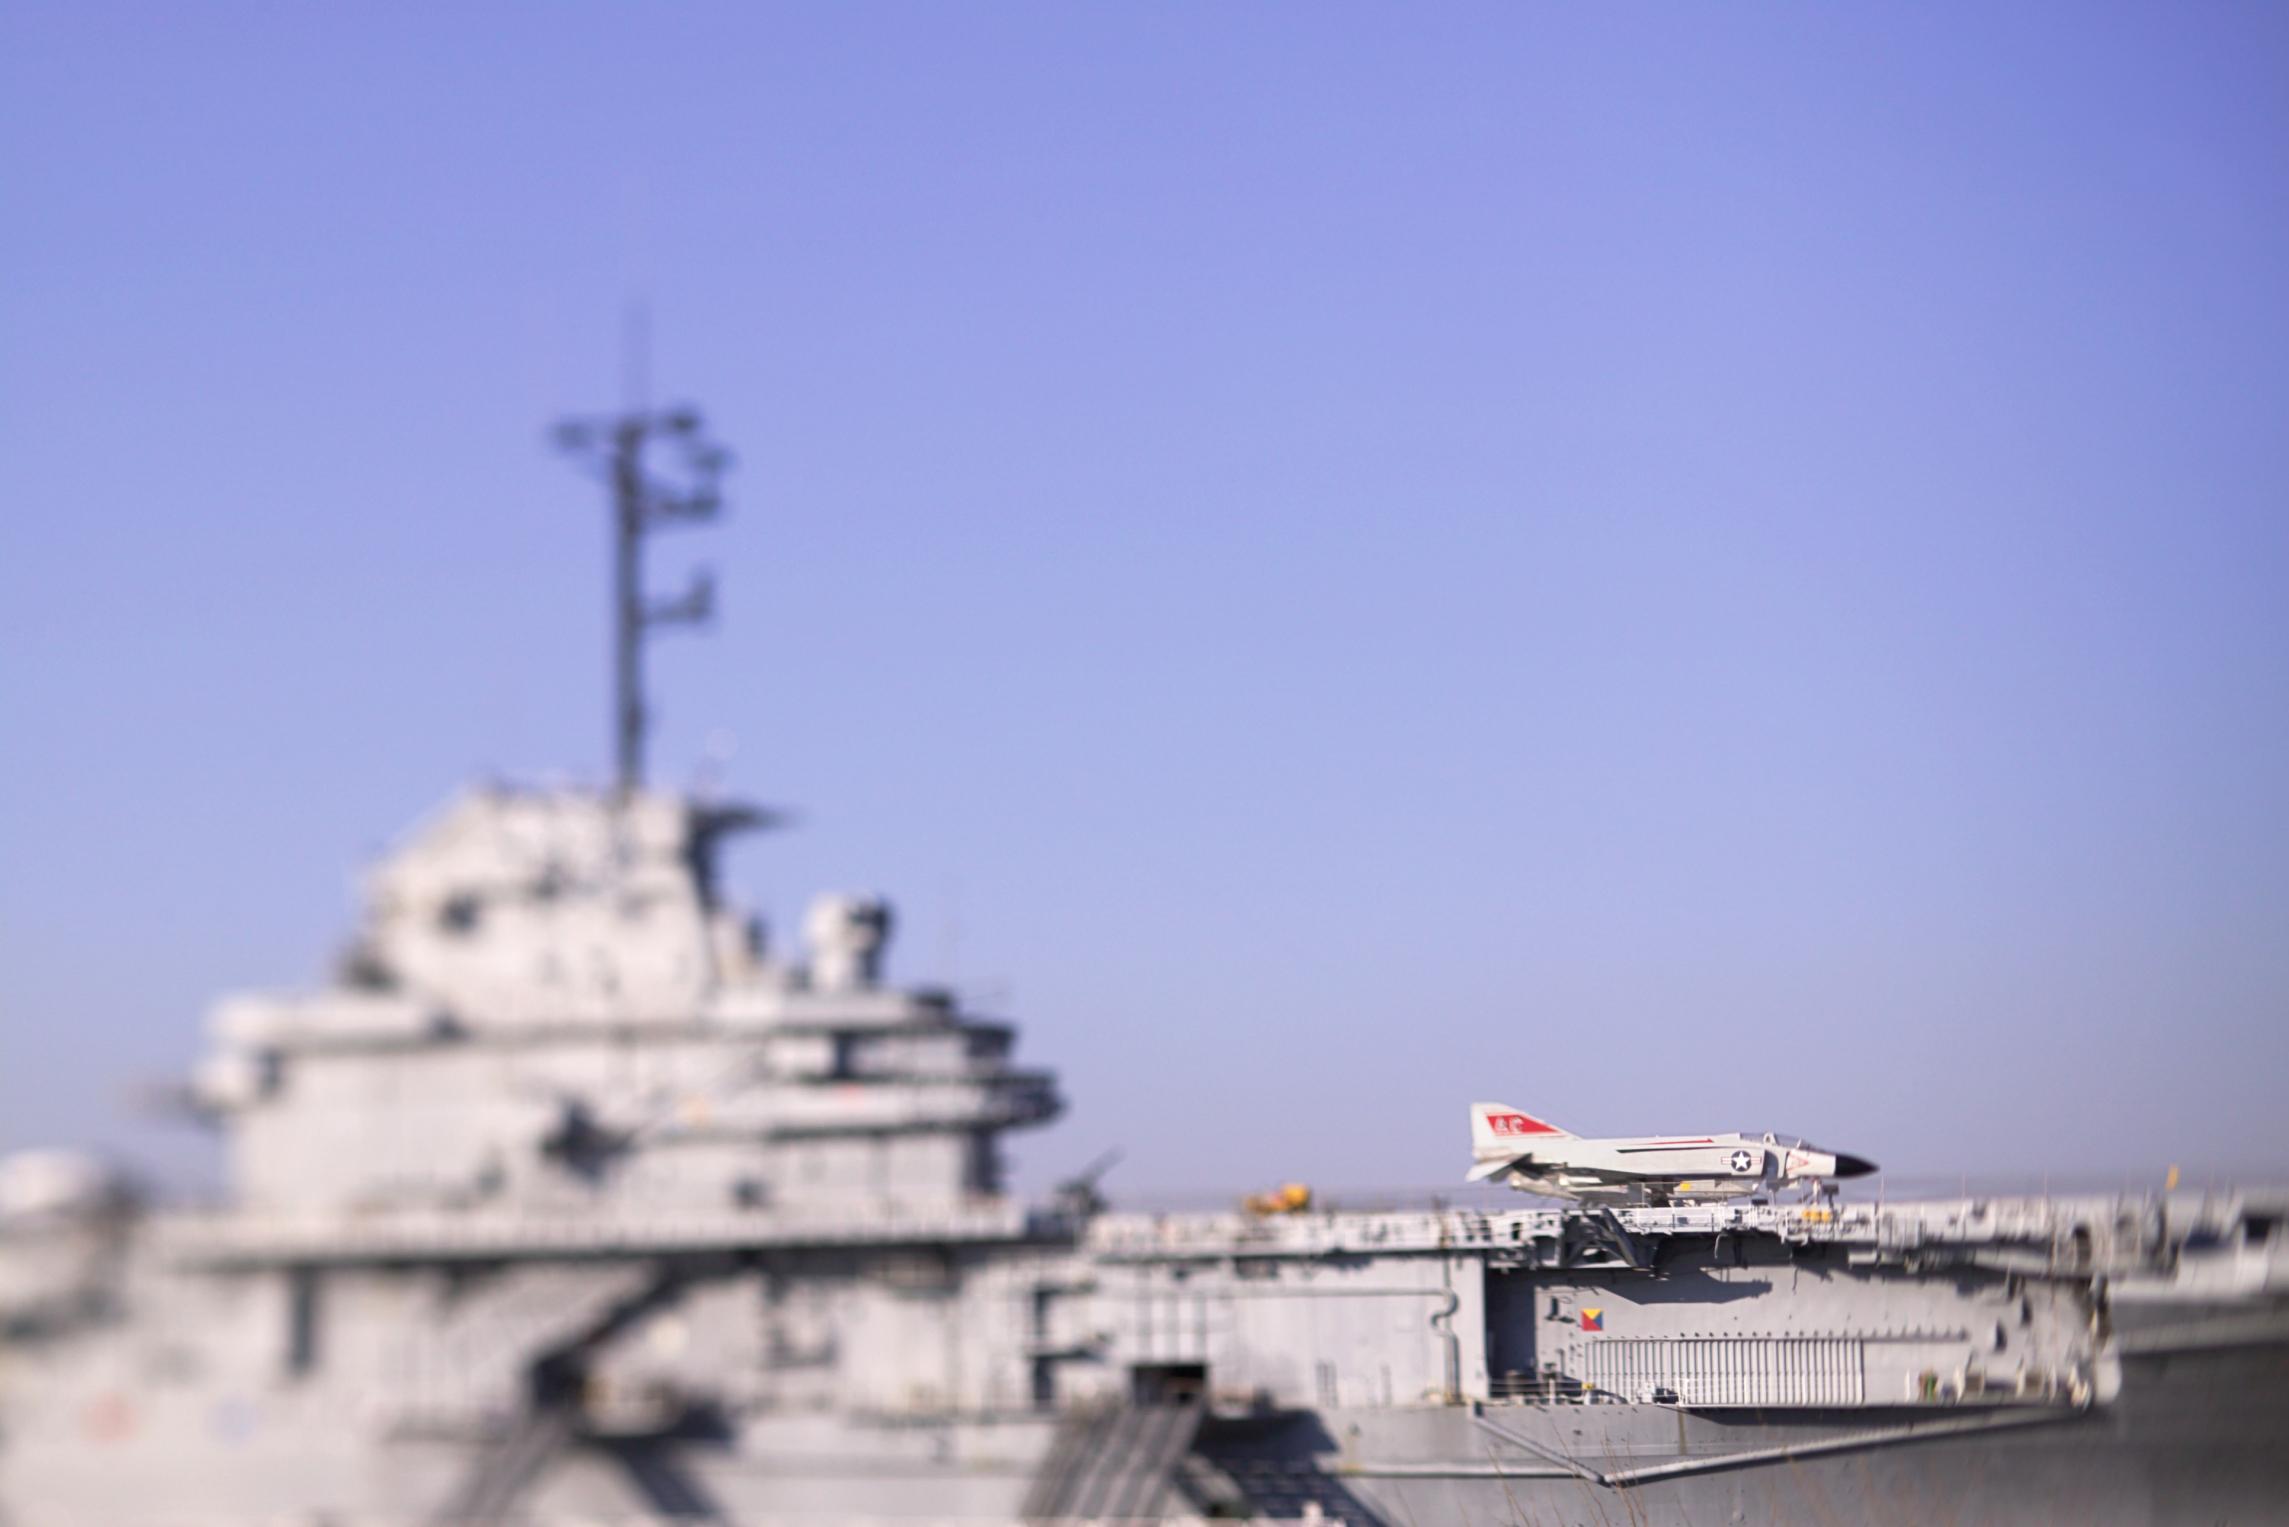 yeoman resume navy resume exles navy resume exles us navy resume